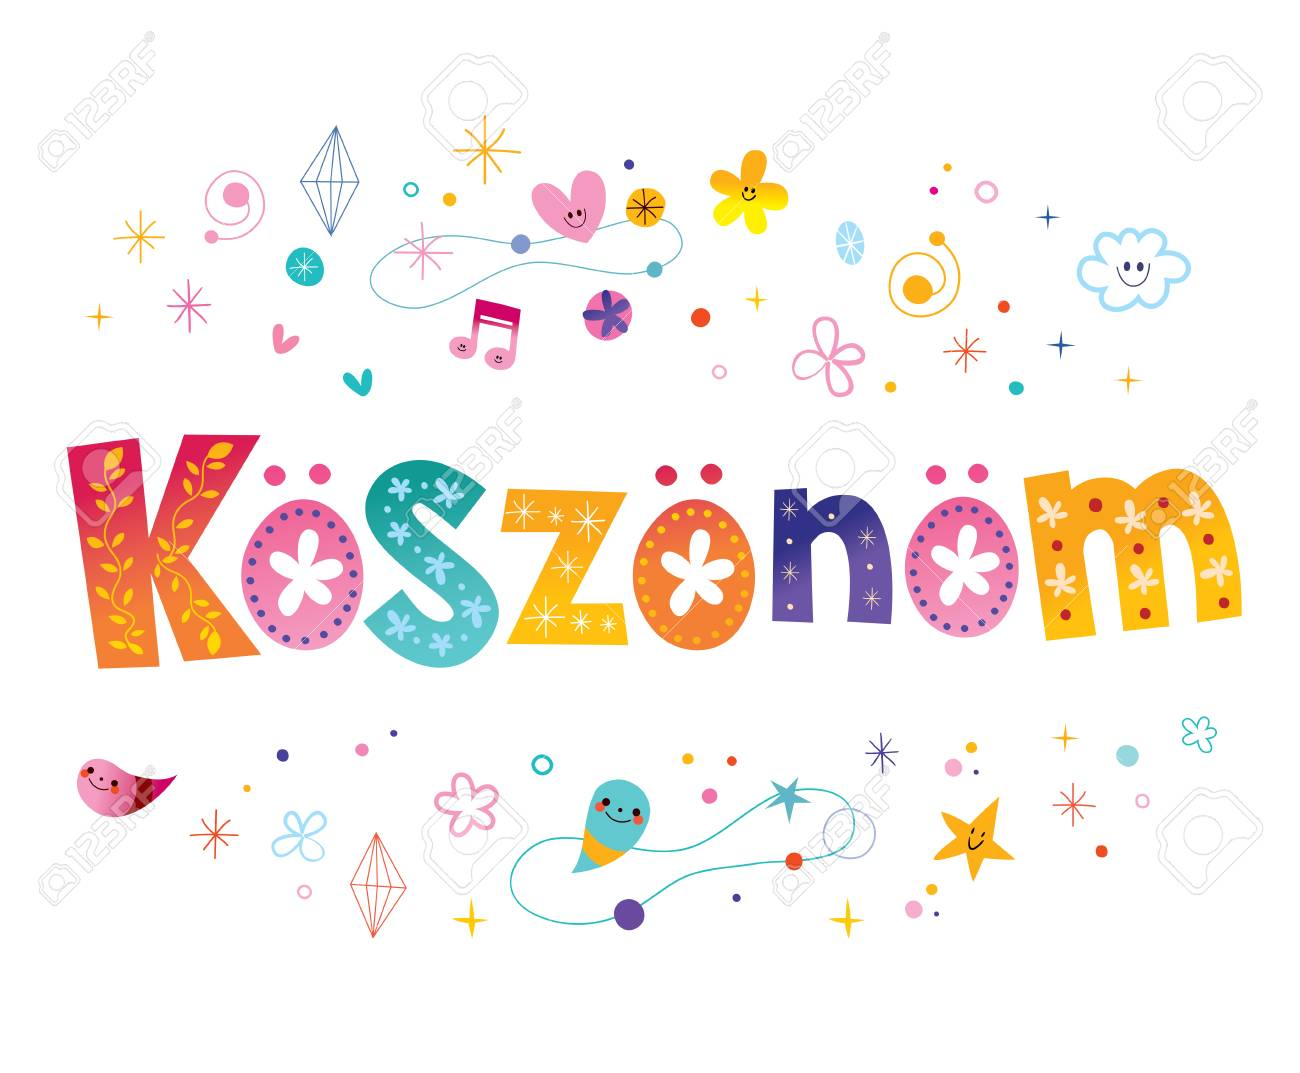 97900776-koszonom-thank-you-in-hungarian-language.jpg